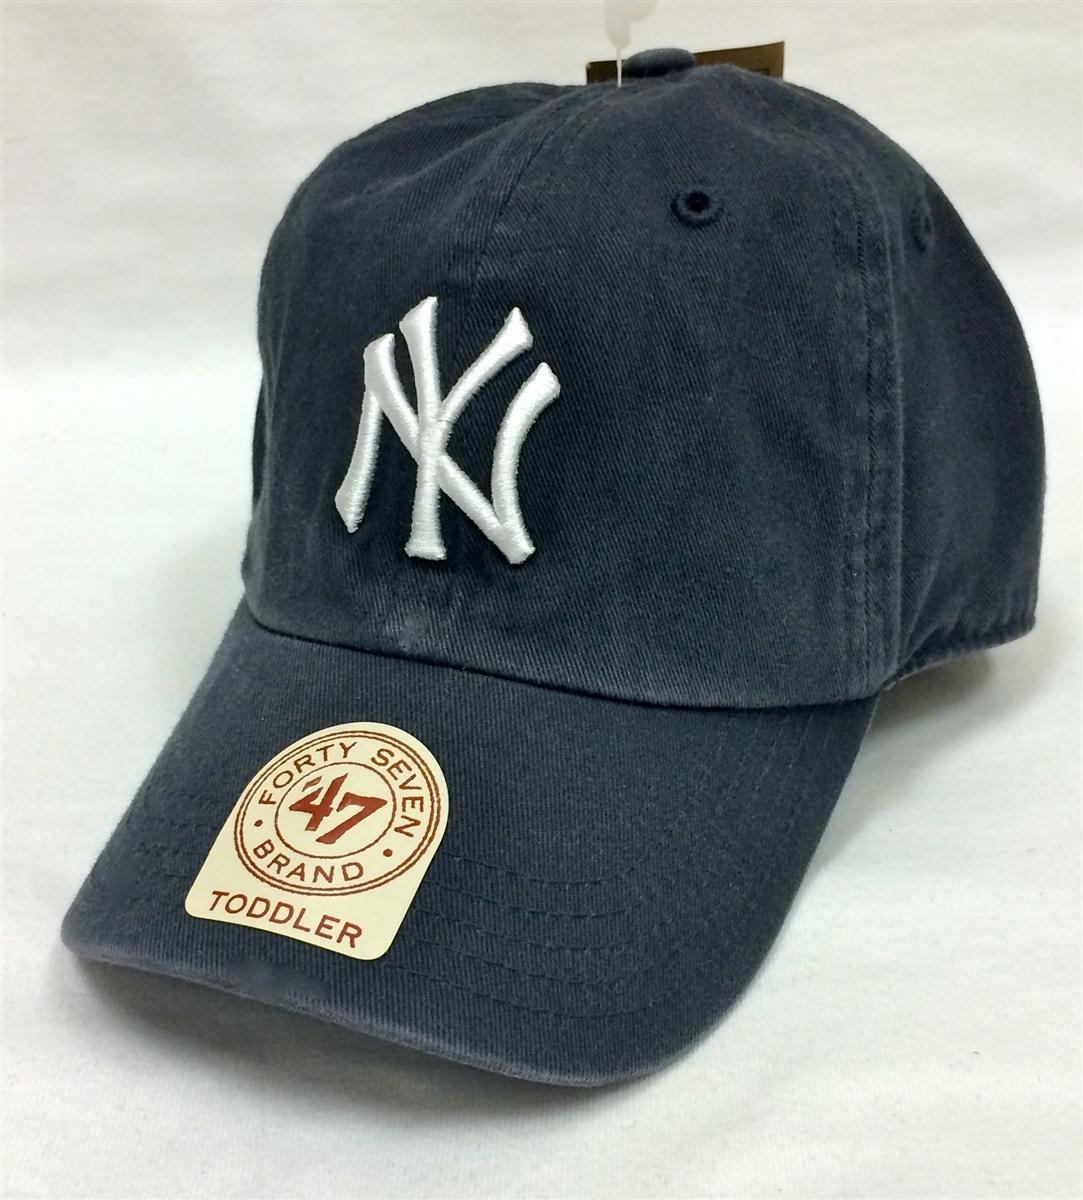 47 Brand Toddler New York Yankees Navy Strapback 8cfae5181fa